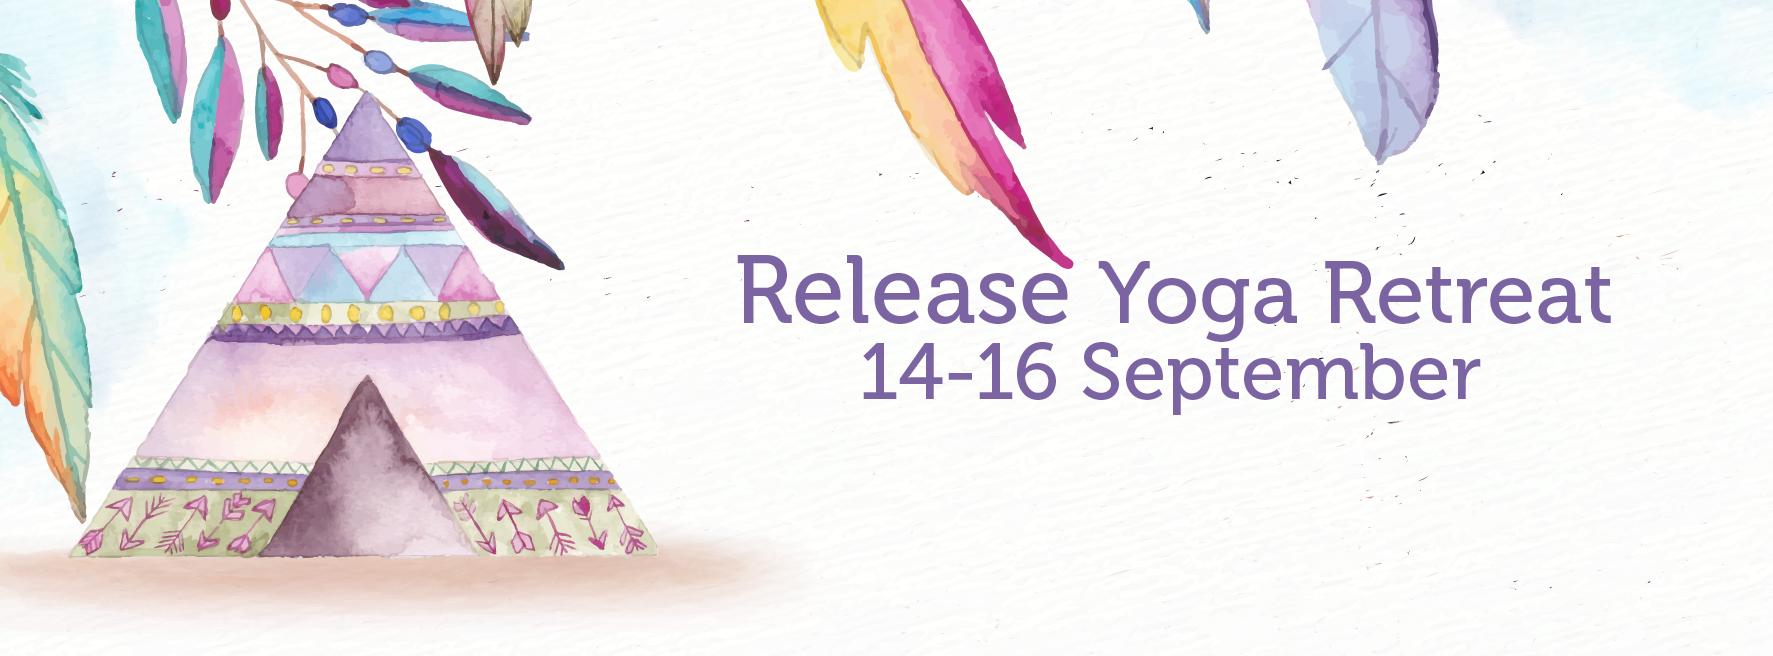 Release Yoga Retreat